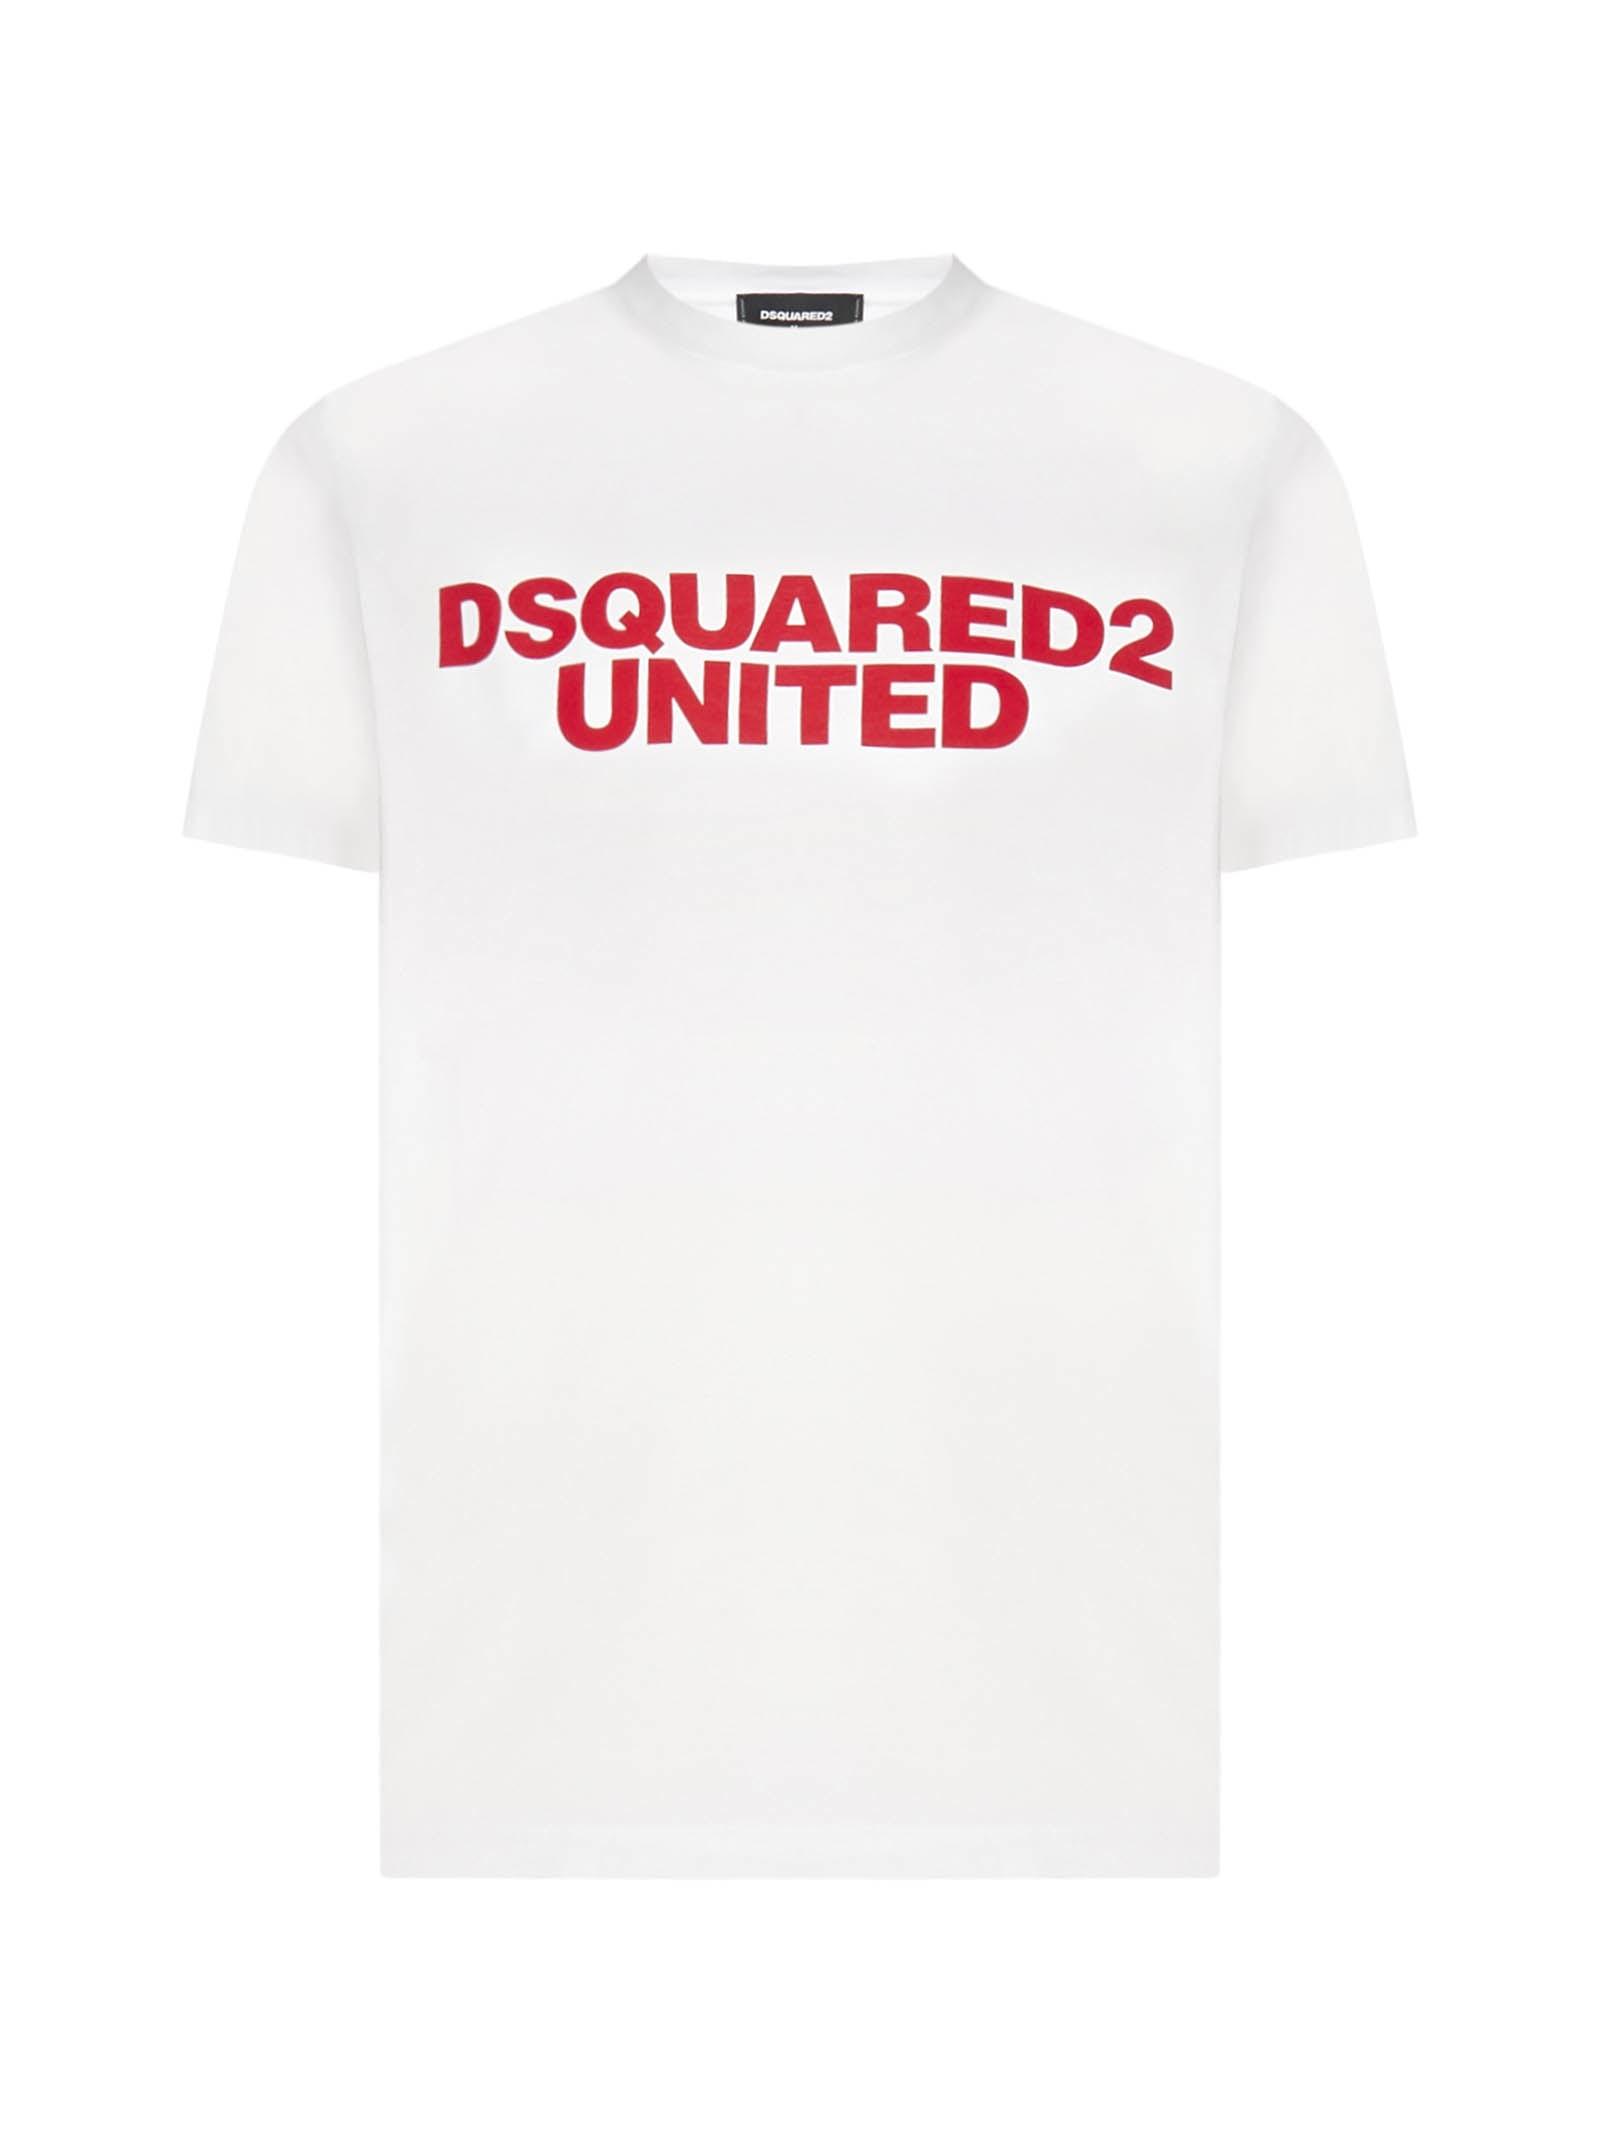 Dsquared2 United Logo Cotton T-shirt